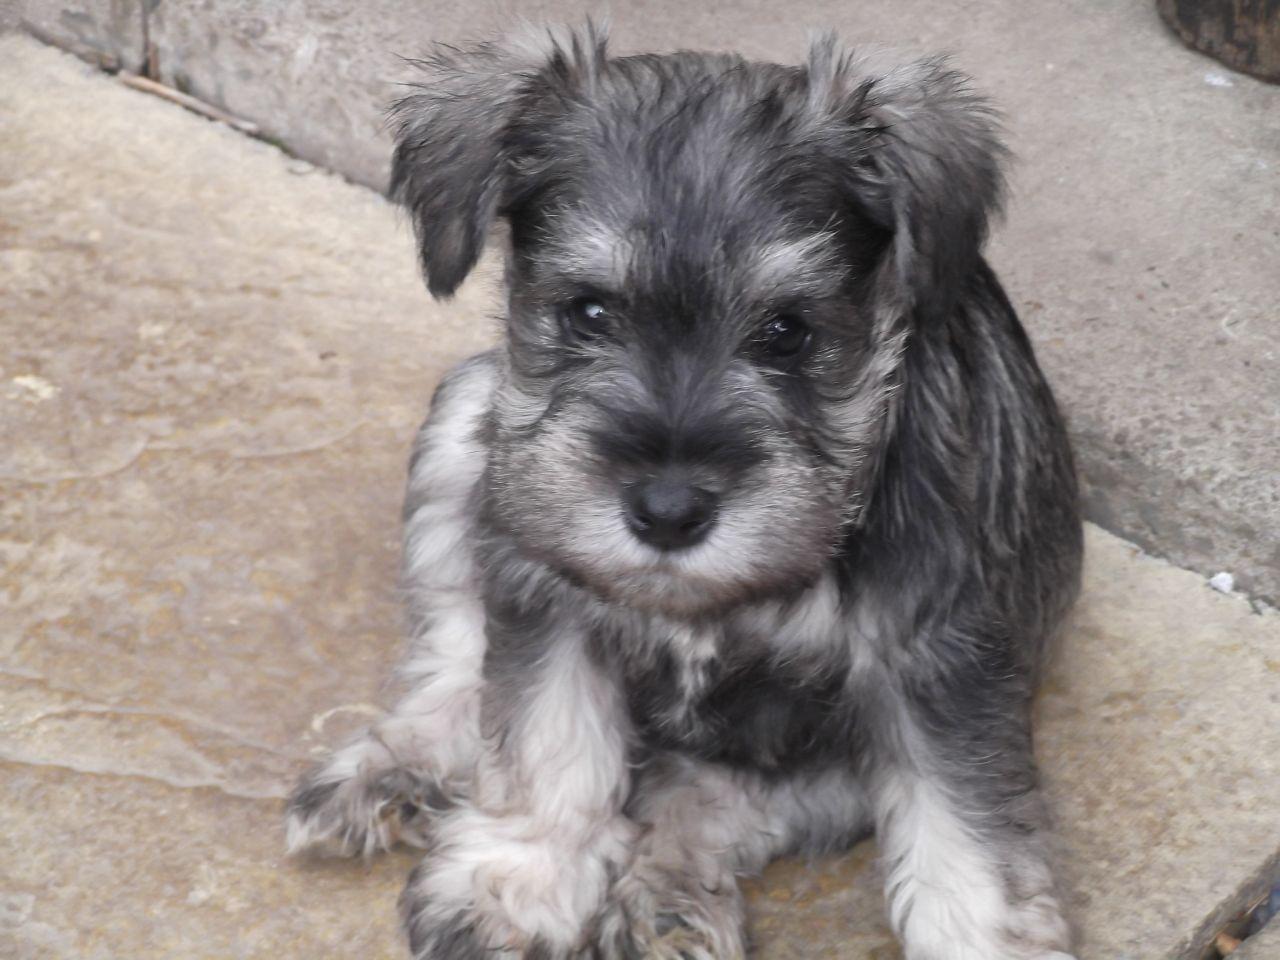 70 Adorable Miniature Schnauzer Dog Images